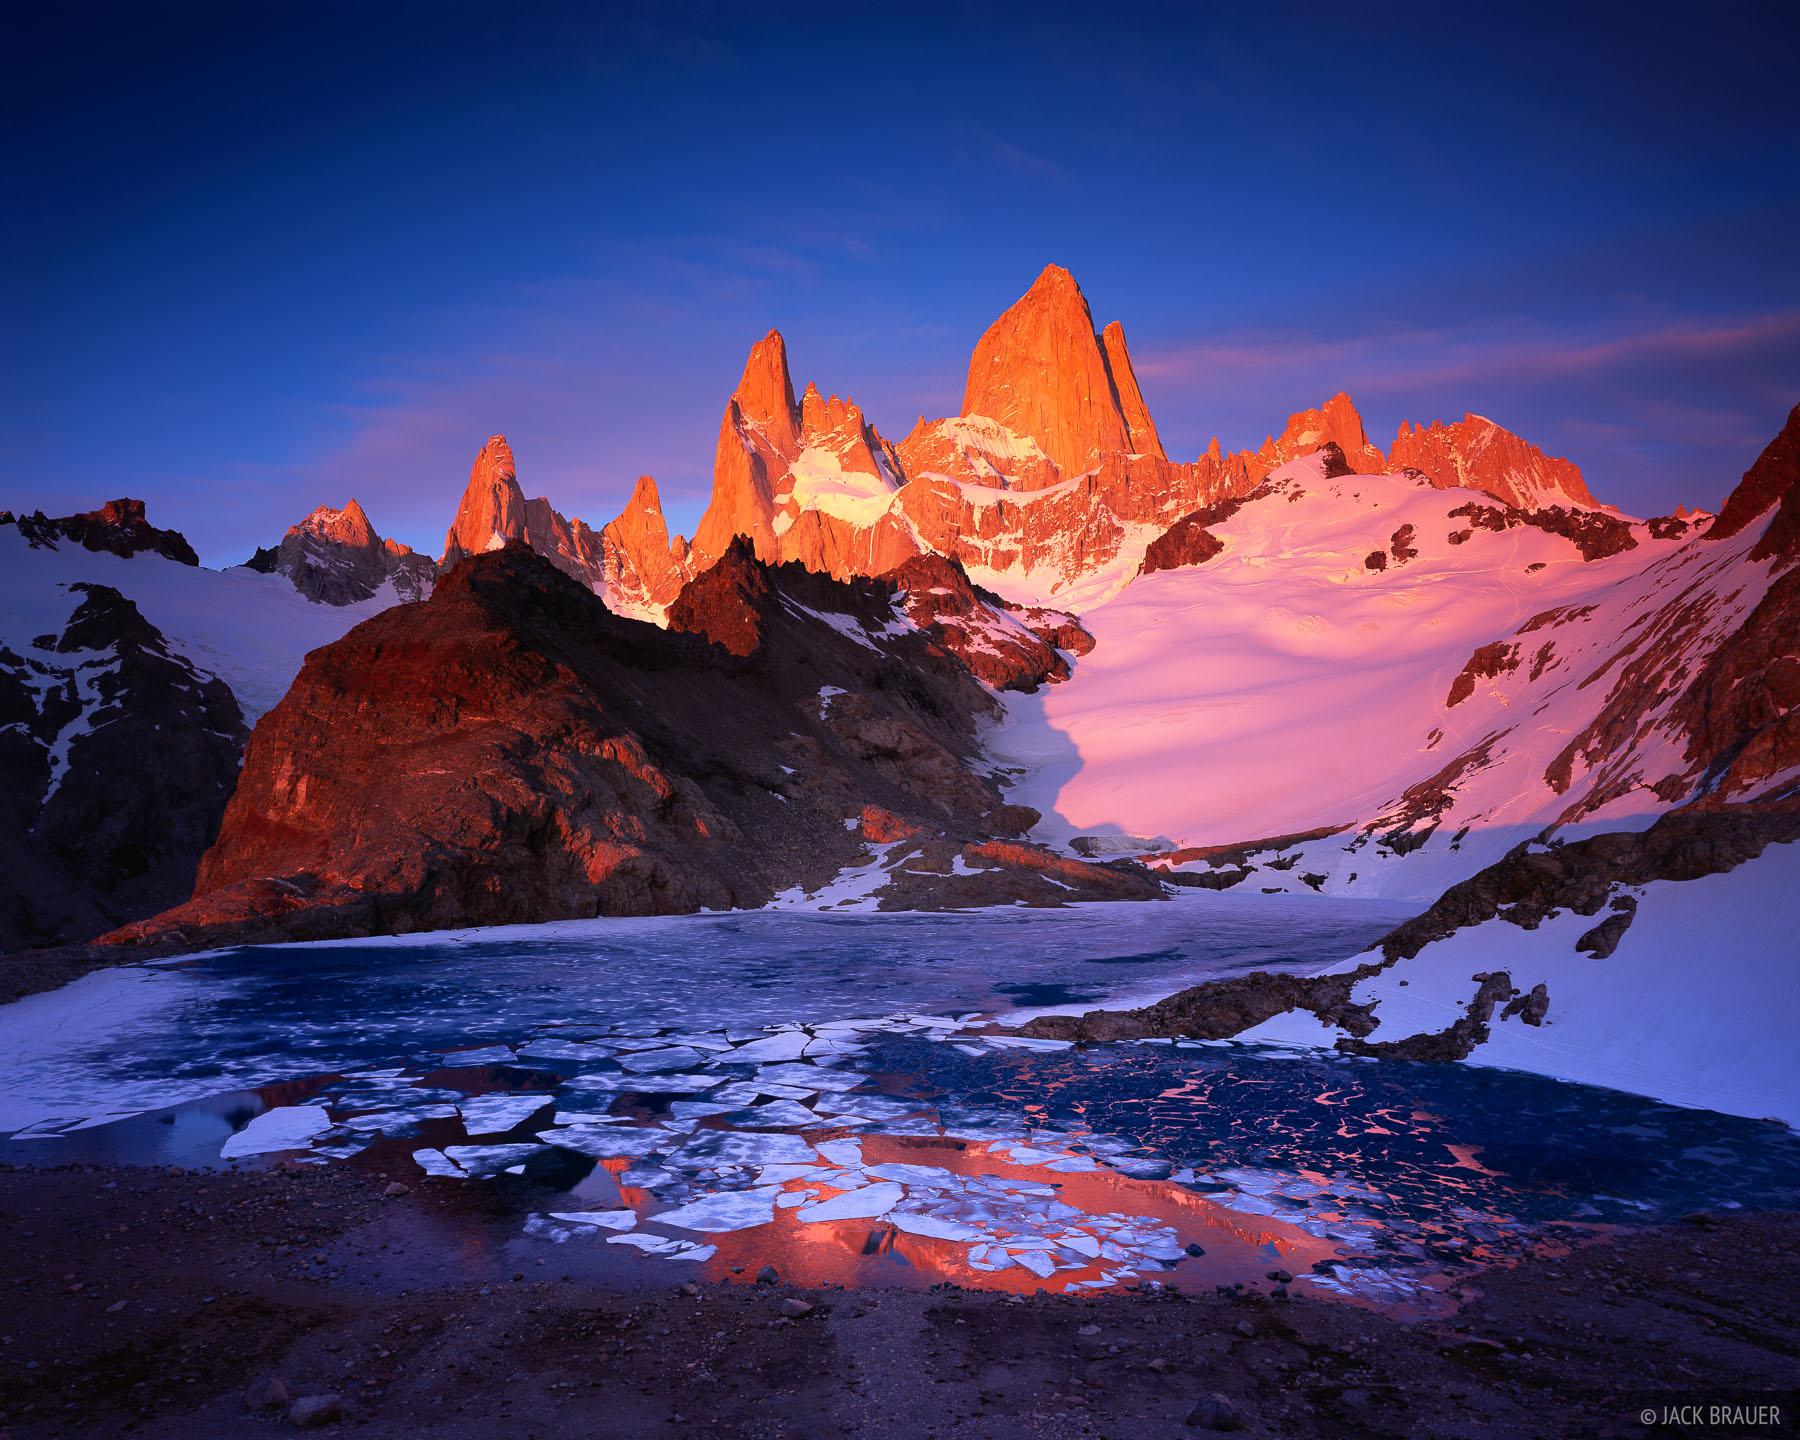 Chalt, Monte Fitz Roy, Laguna de los Tres, Argentina, Patagonia, photo